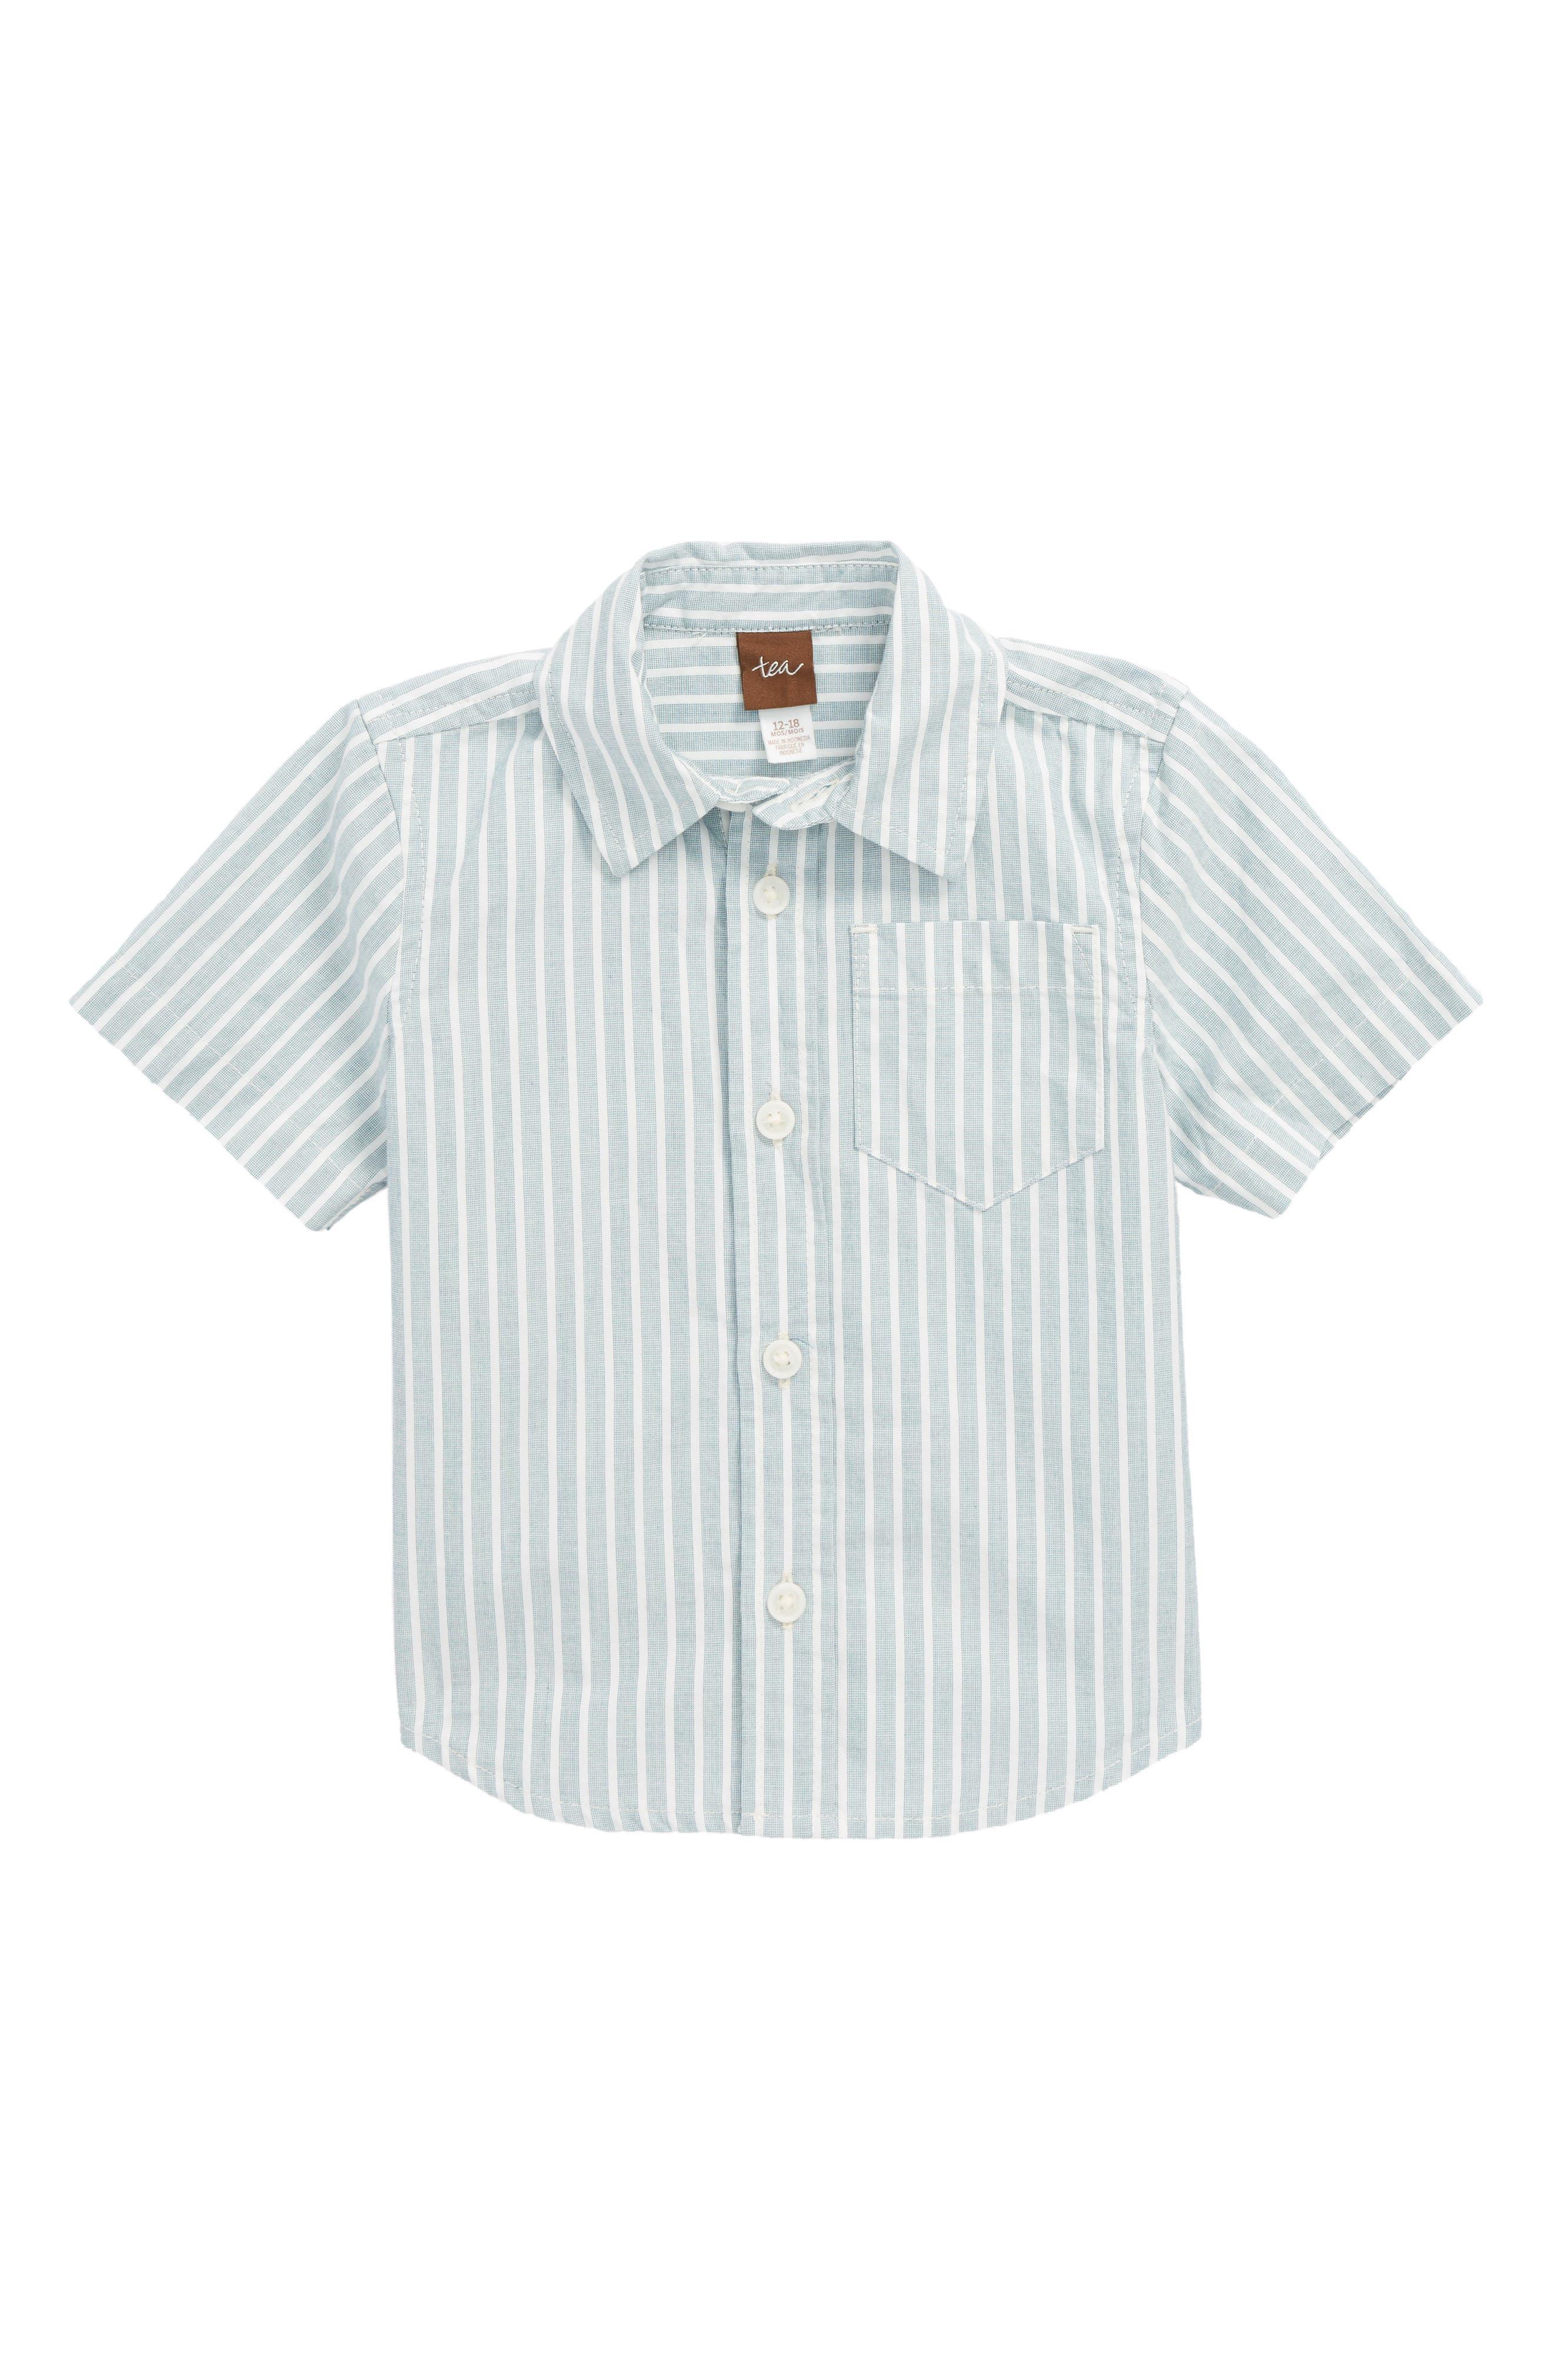 Stripe Woven Shirt,                             Main thumbnail 1, color,                             Striped